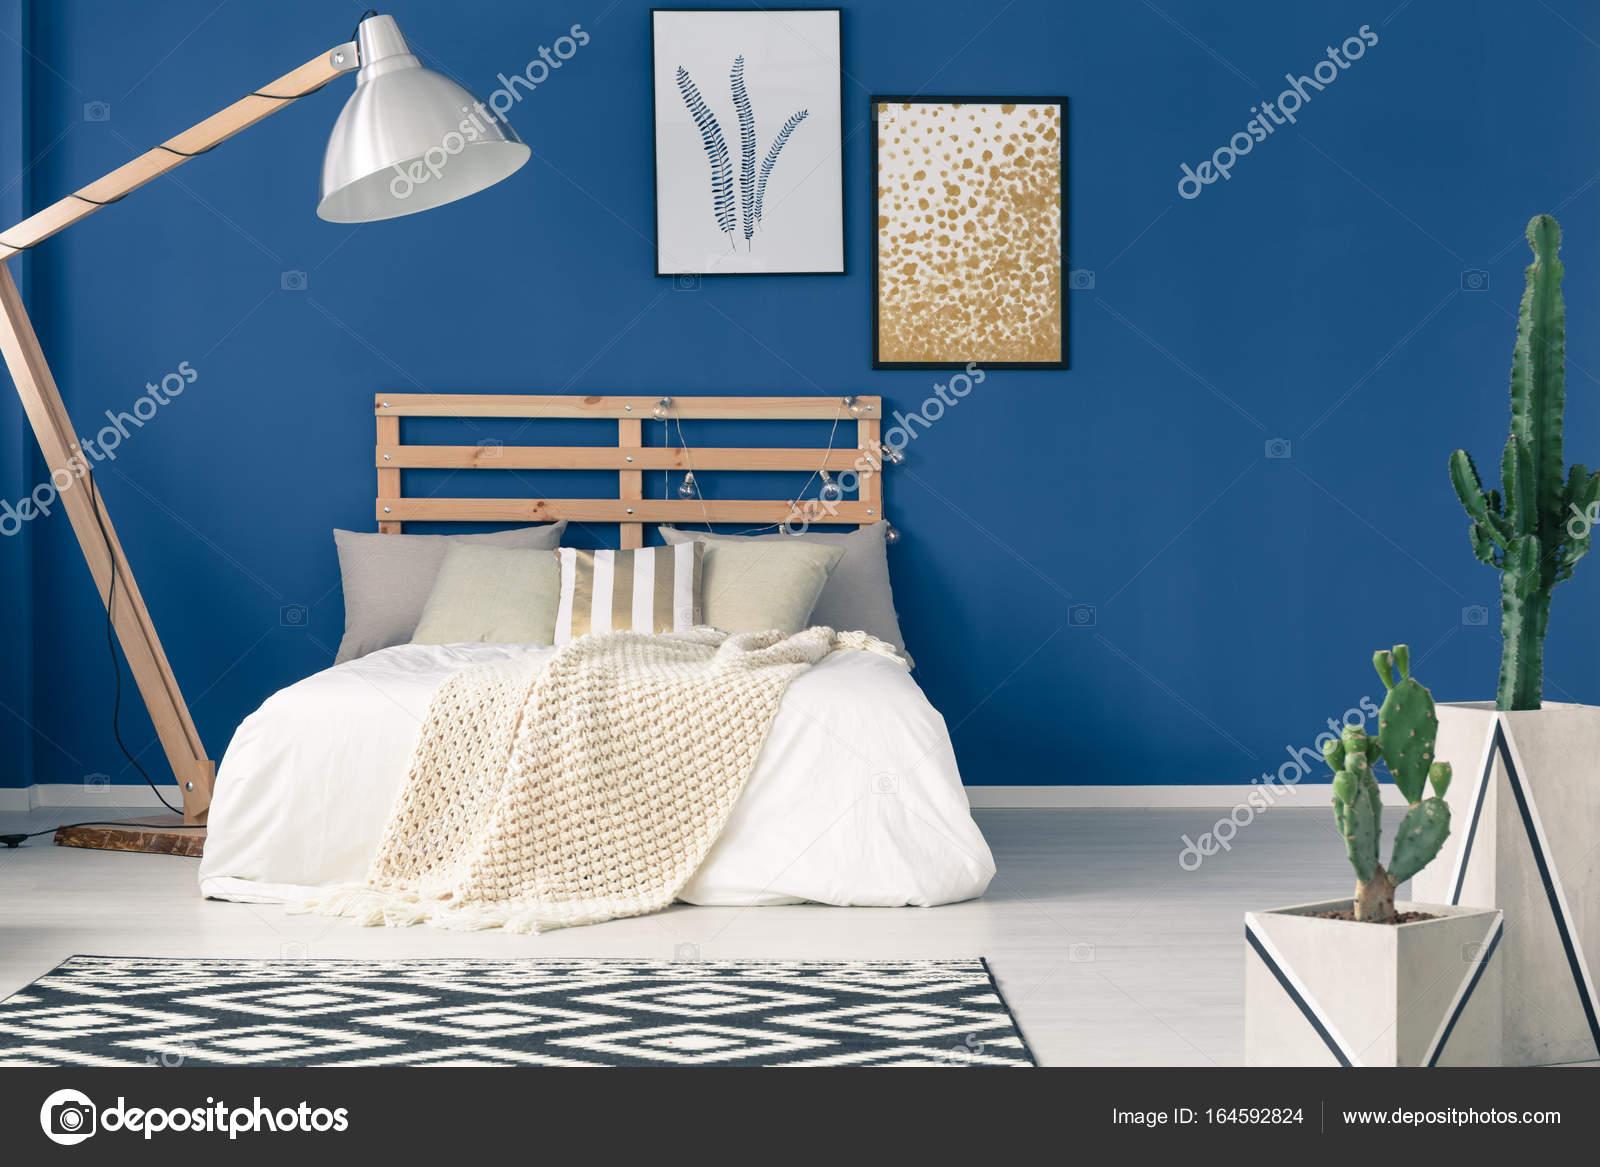 Pareti blu e luce biancheria da letto — Foto Stock © photographee.eu ...